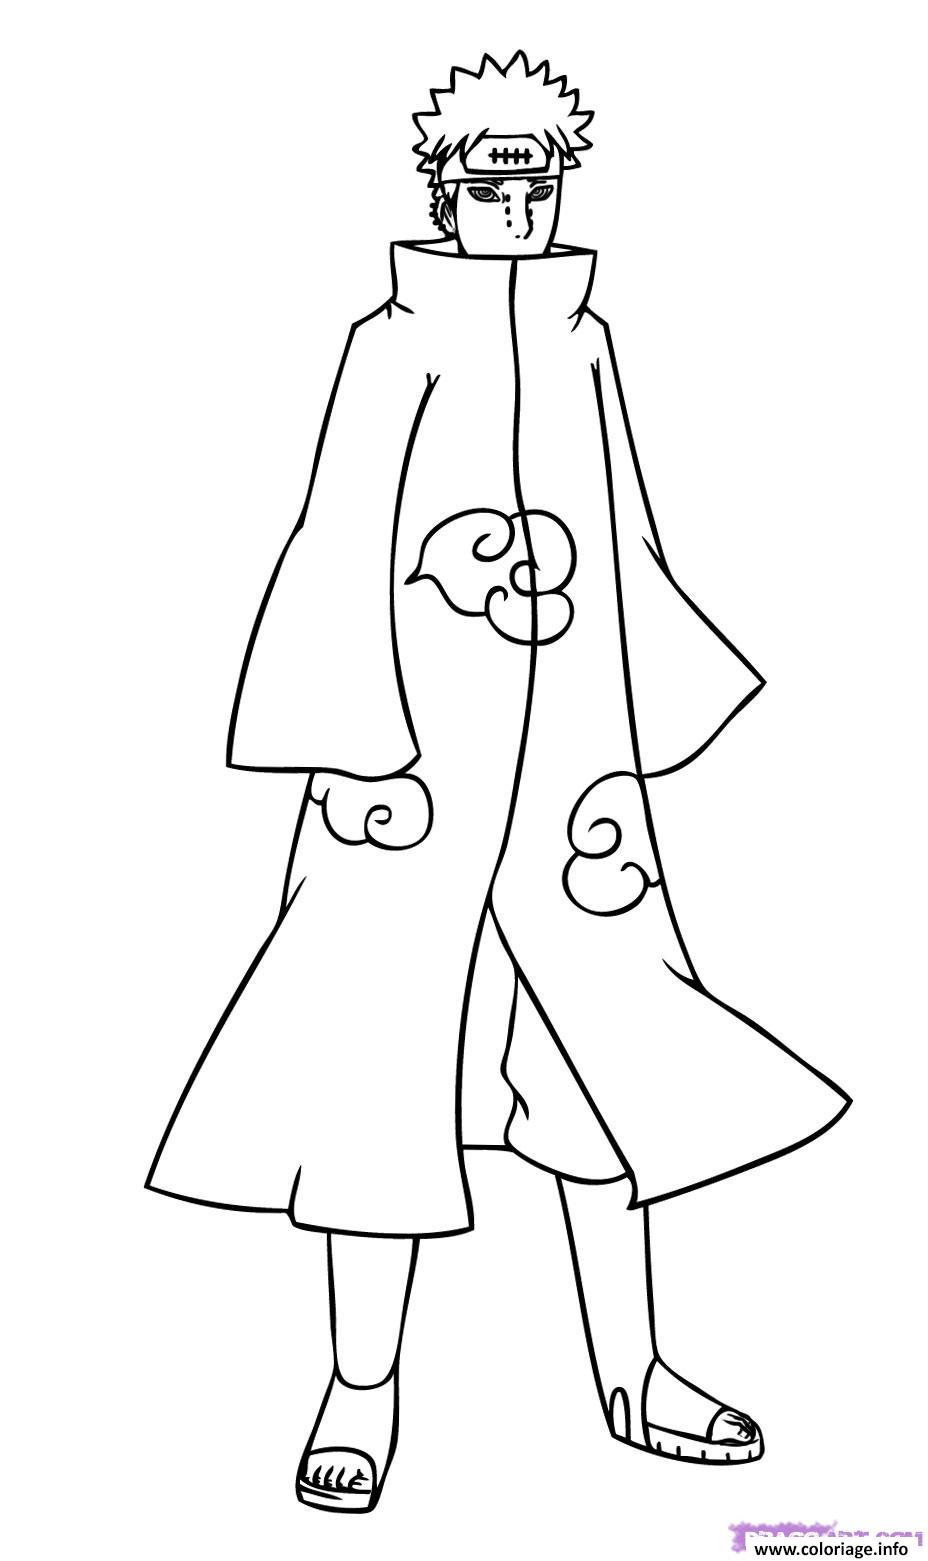 Coloriage manga naruto 163 dessin - Image a colorier naruto ...